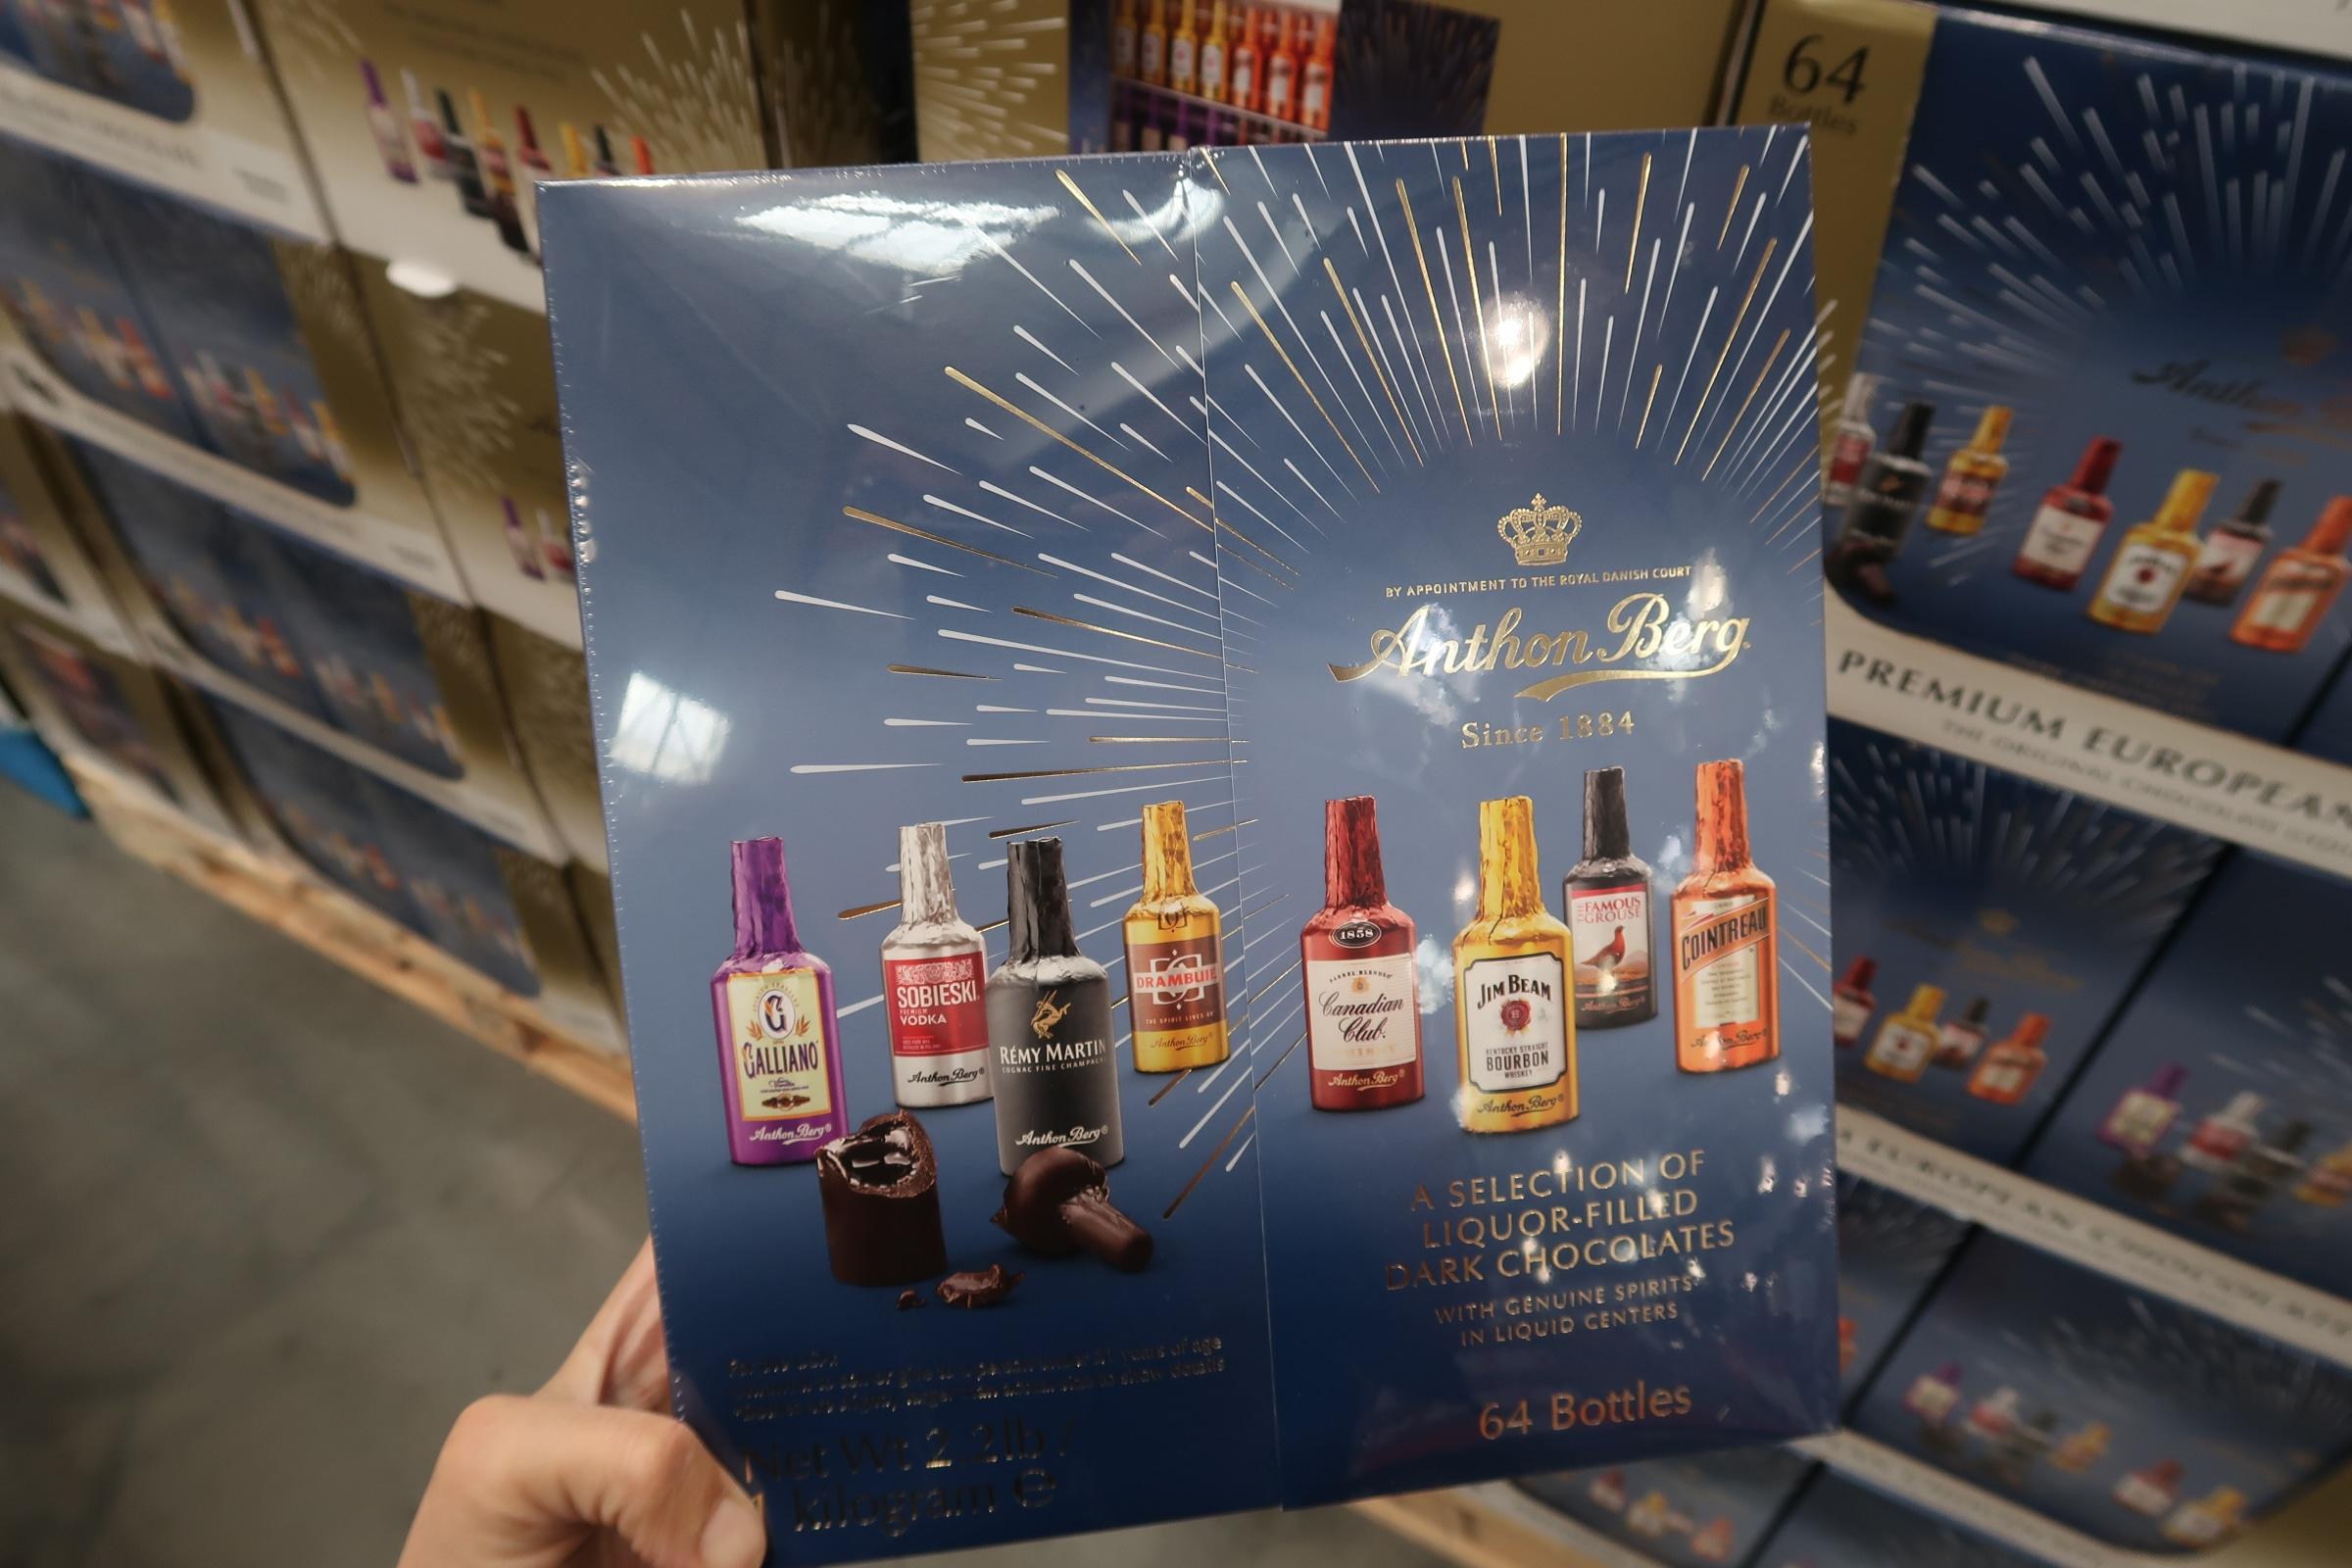 Anthony Berg European Liquor Filled Chocolates $17.59